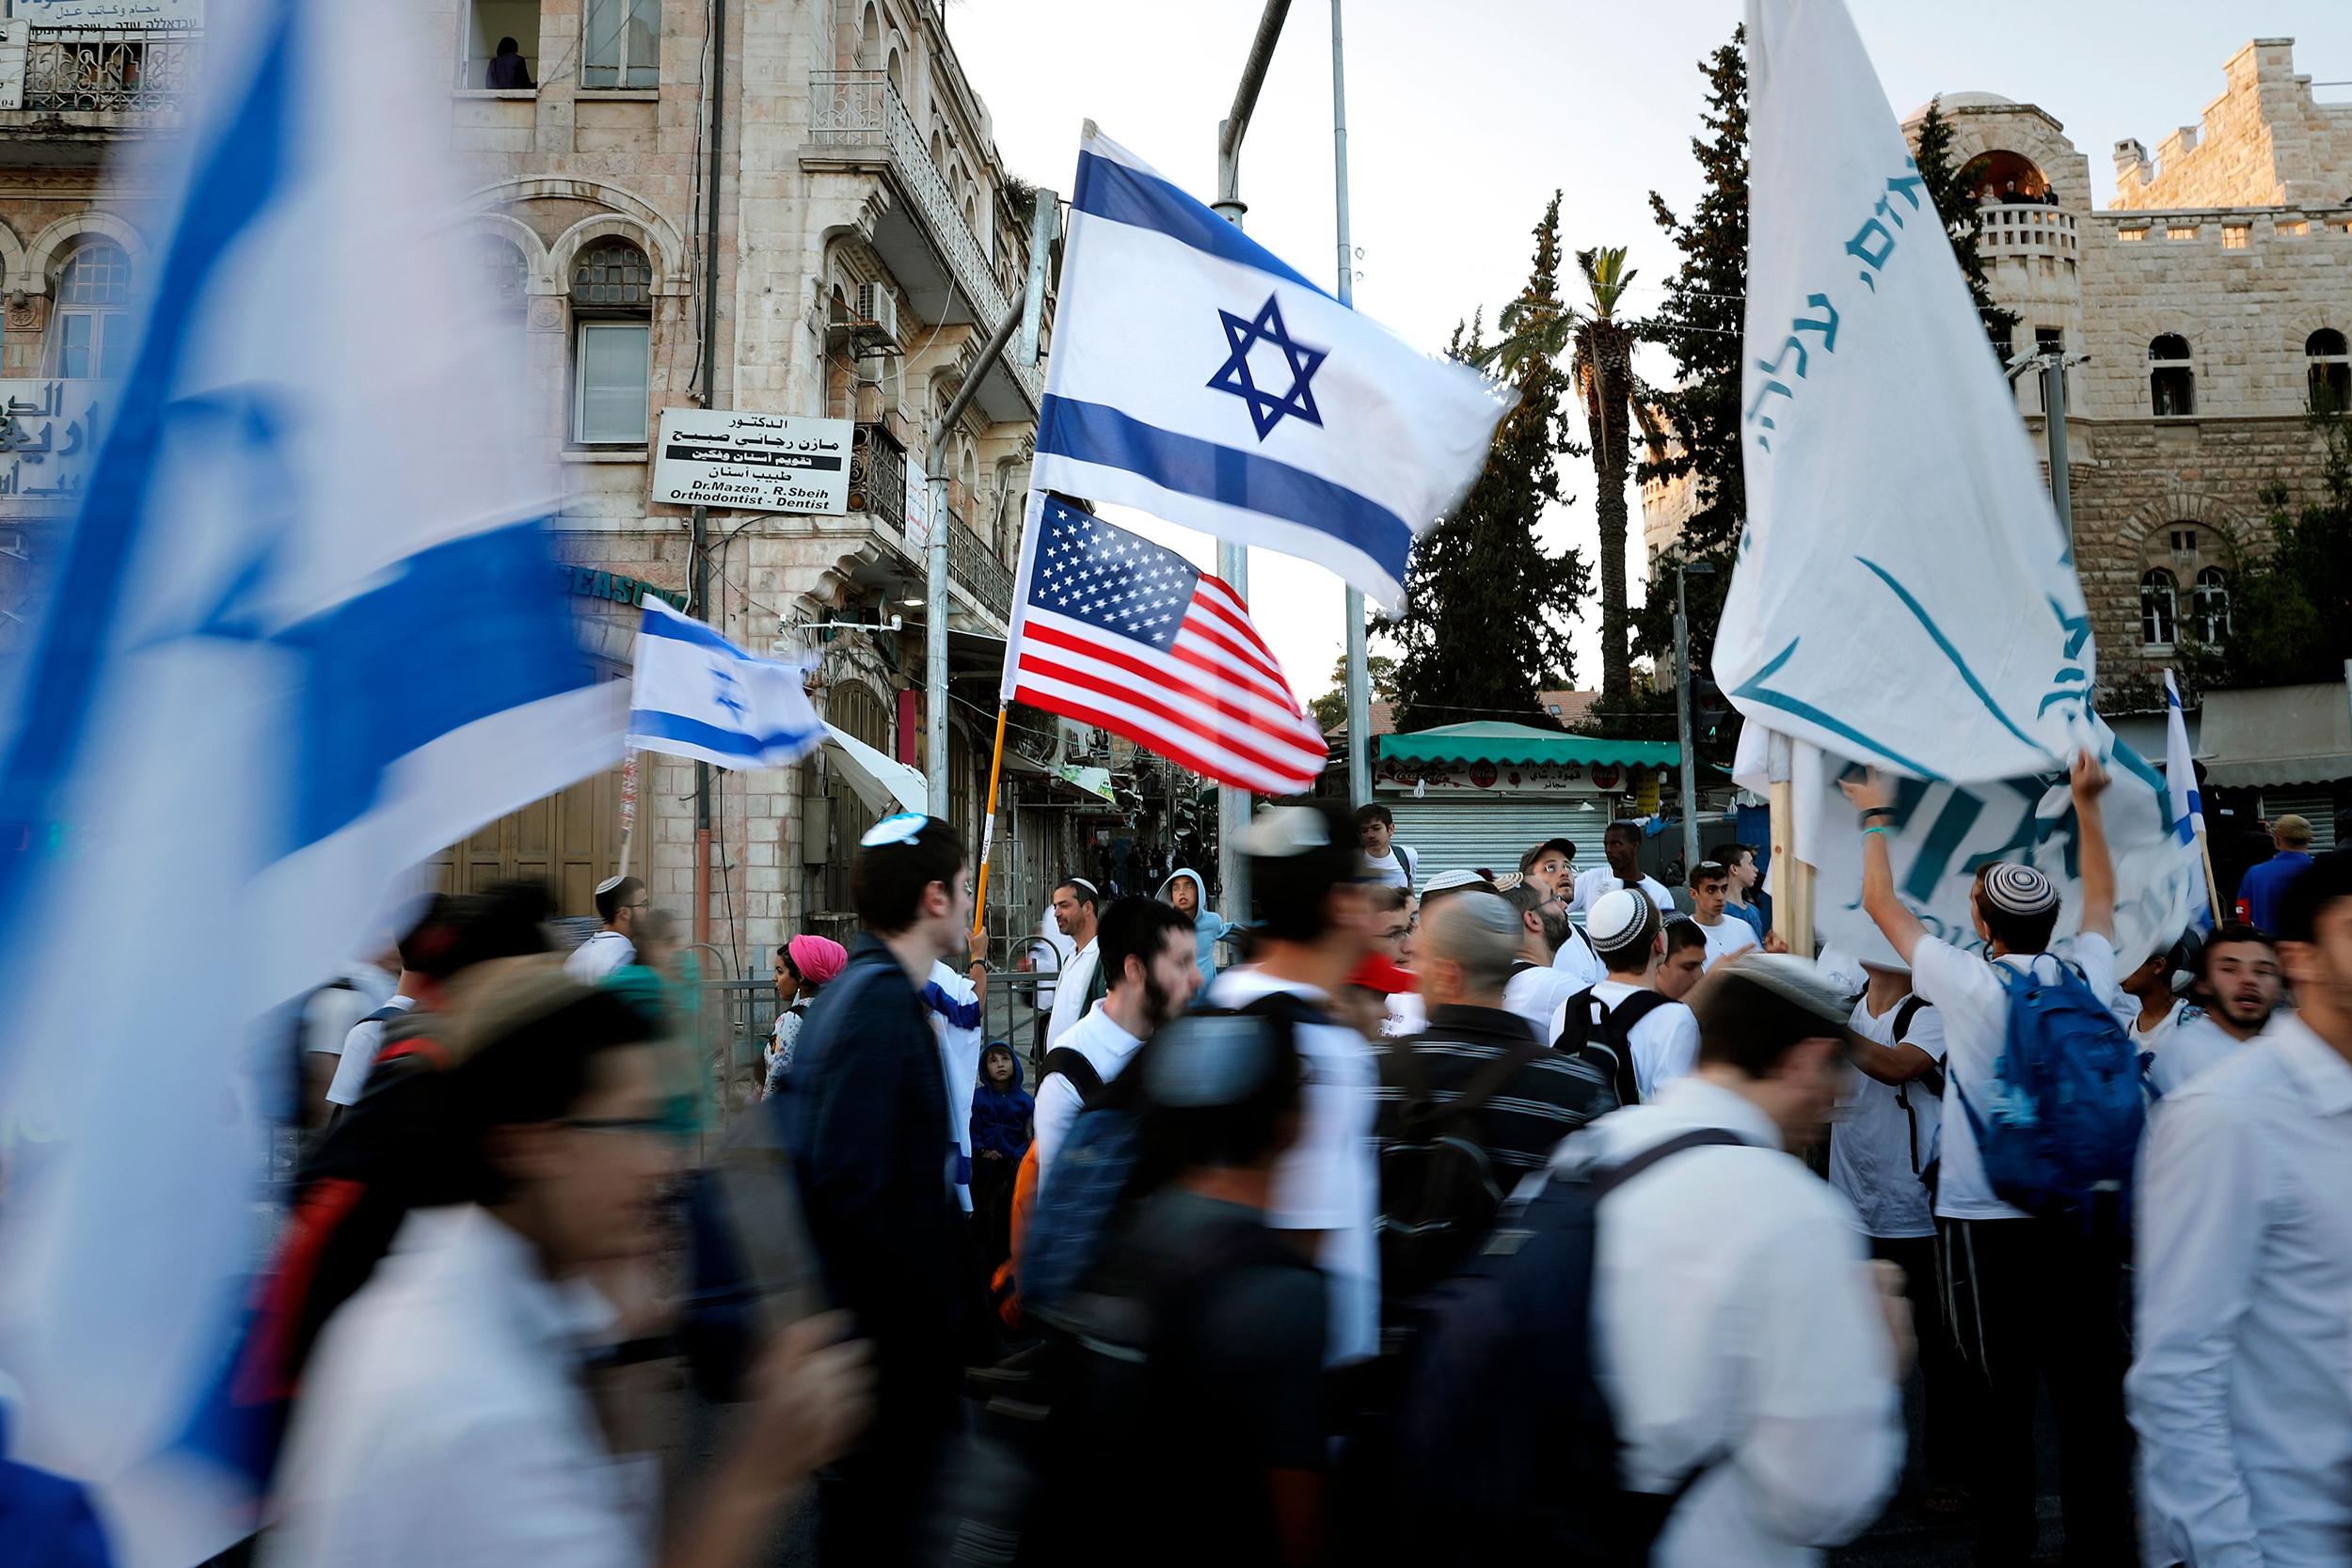 Tensions run high ahead of U.S. Embassy opening in Jerusalem